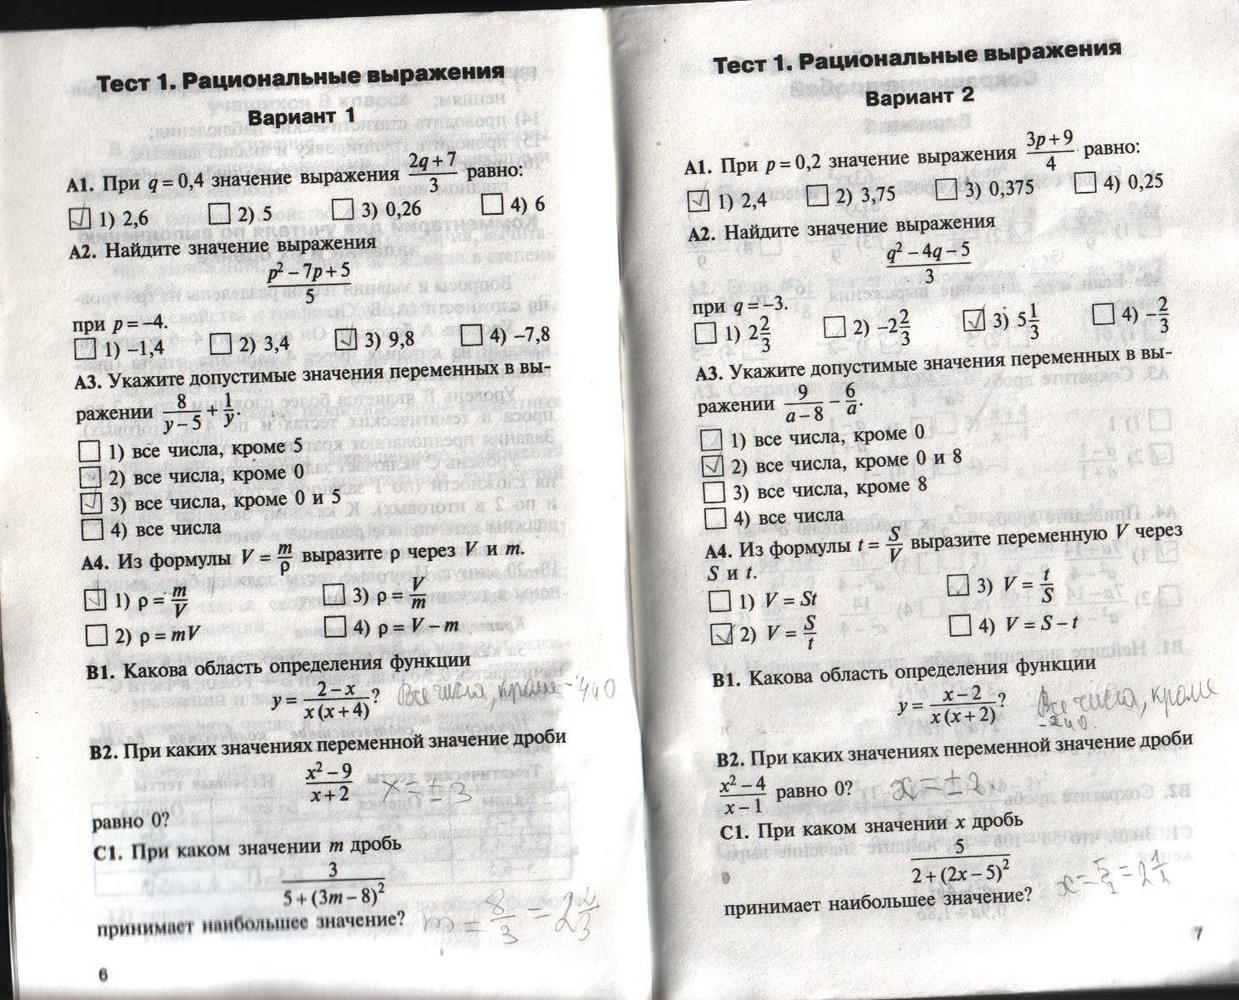 Гдз по алгебре 9 класс ким онлайн